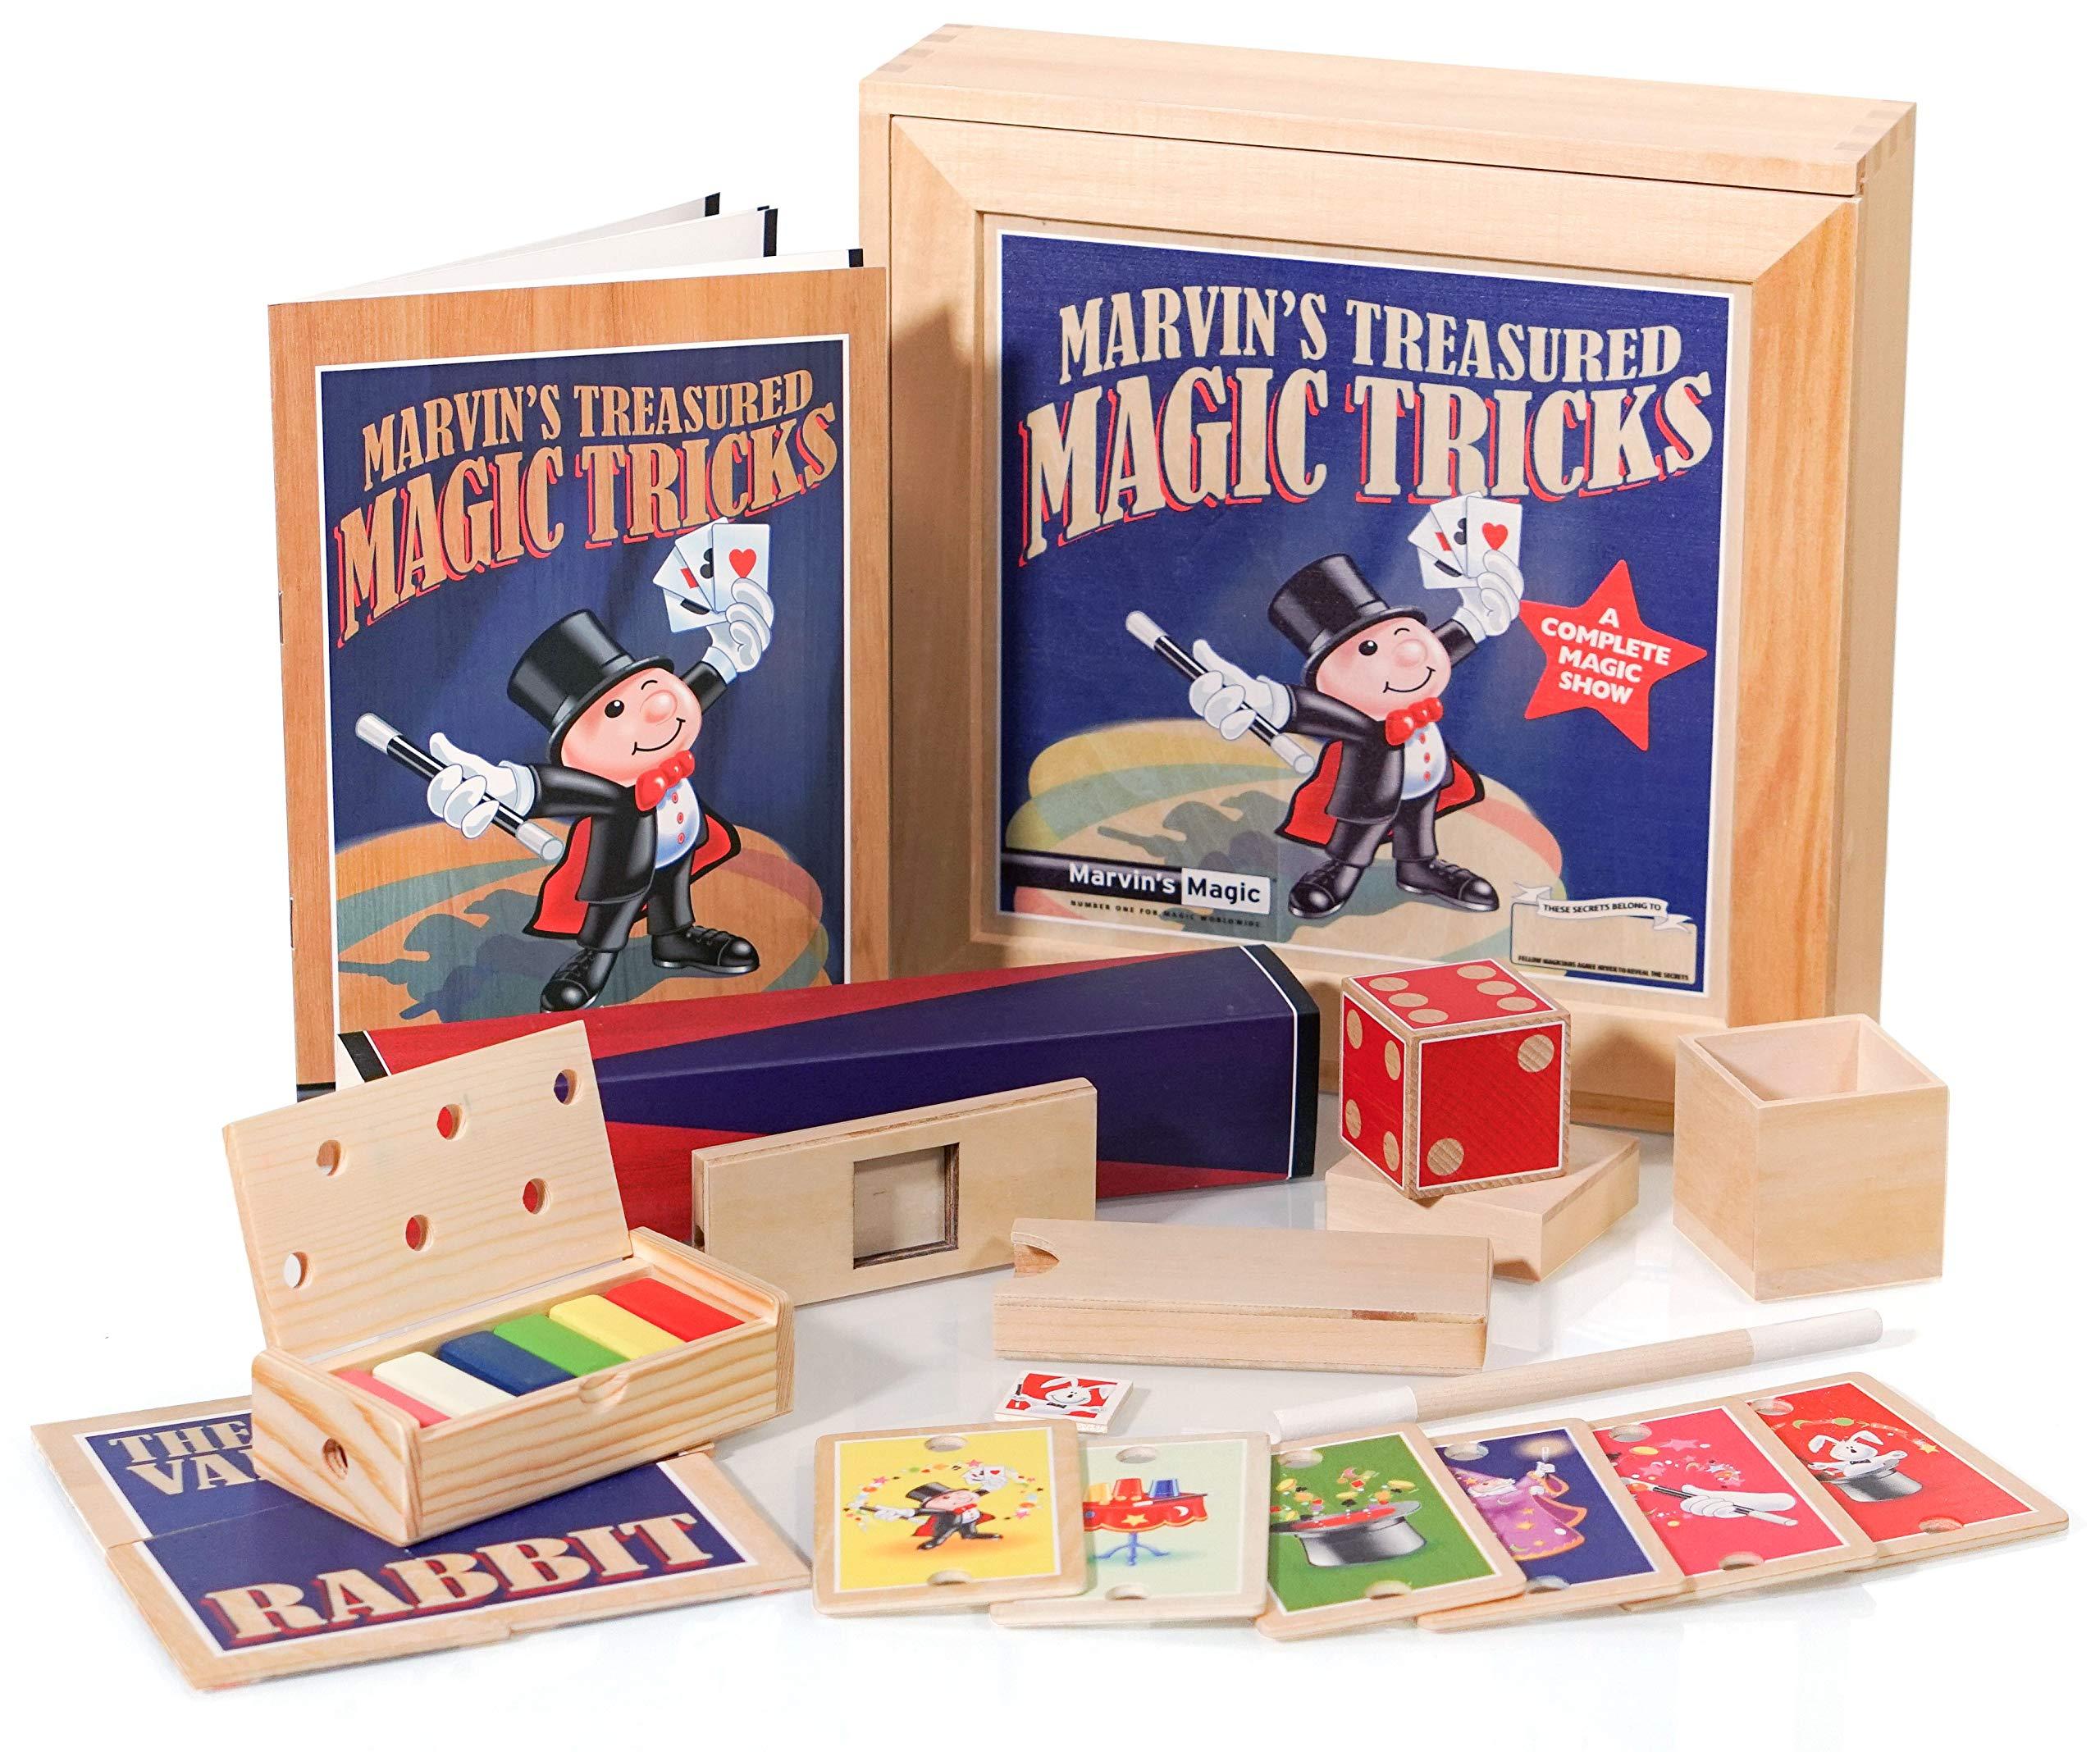 Marvin's Magic - Treasured Tricks Wooden Magic Tricks Set For Kids | Includes Escaping Coloured Blocks, Vanishing Rabbit Illusion, Amazing Rising Cards + More